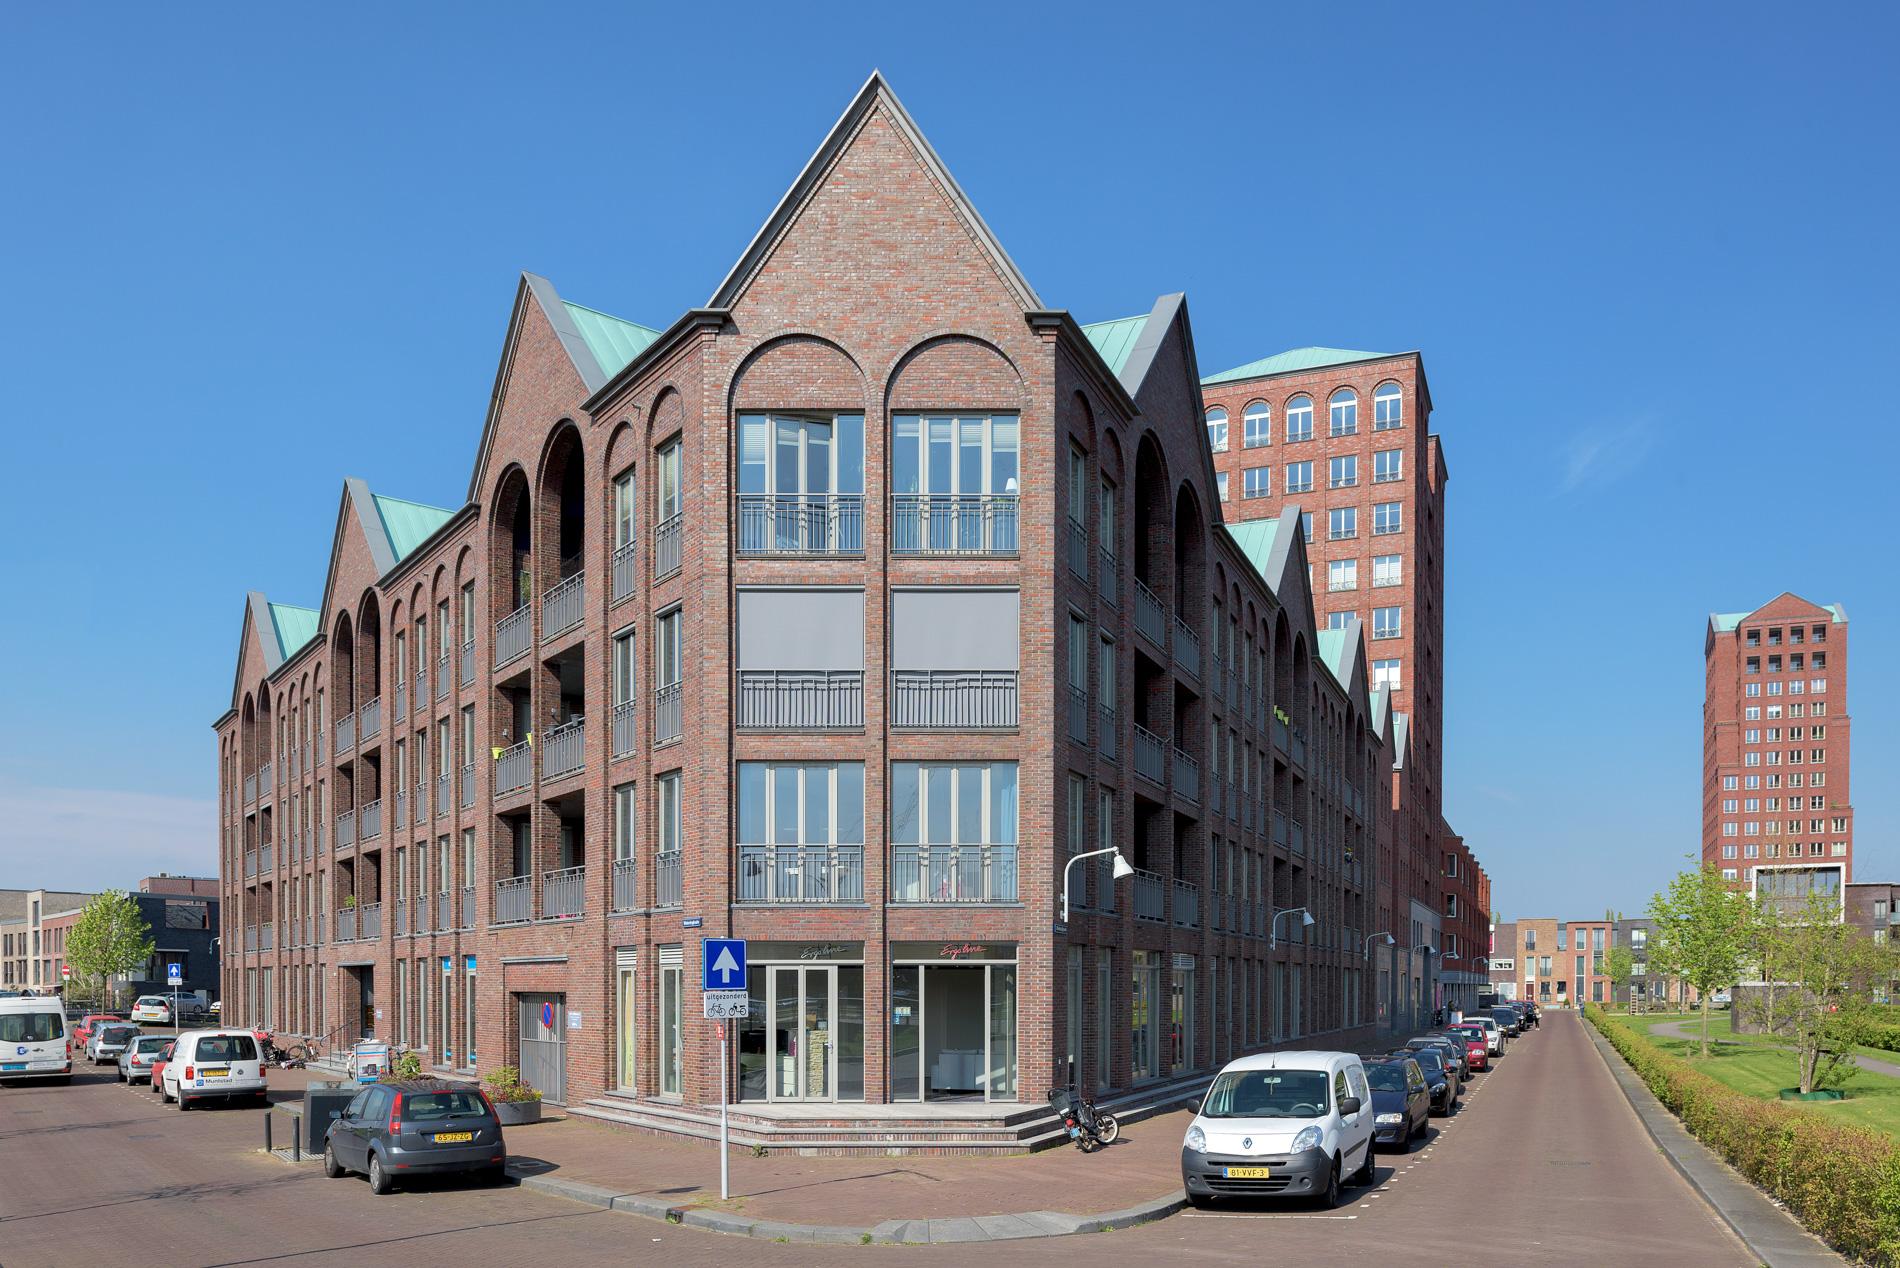 Adres for Interieur amersfoort